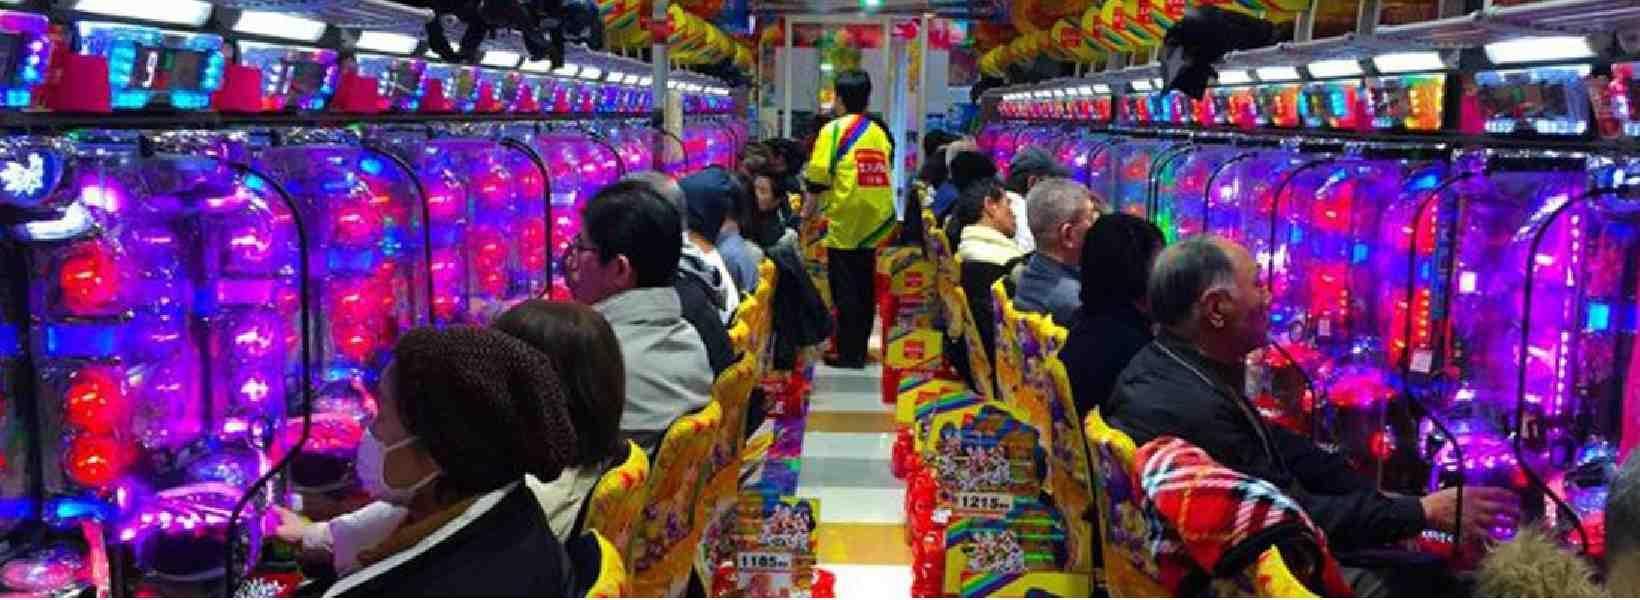 jocuri pachinko japonia